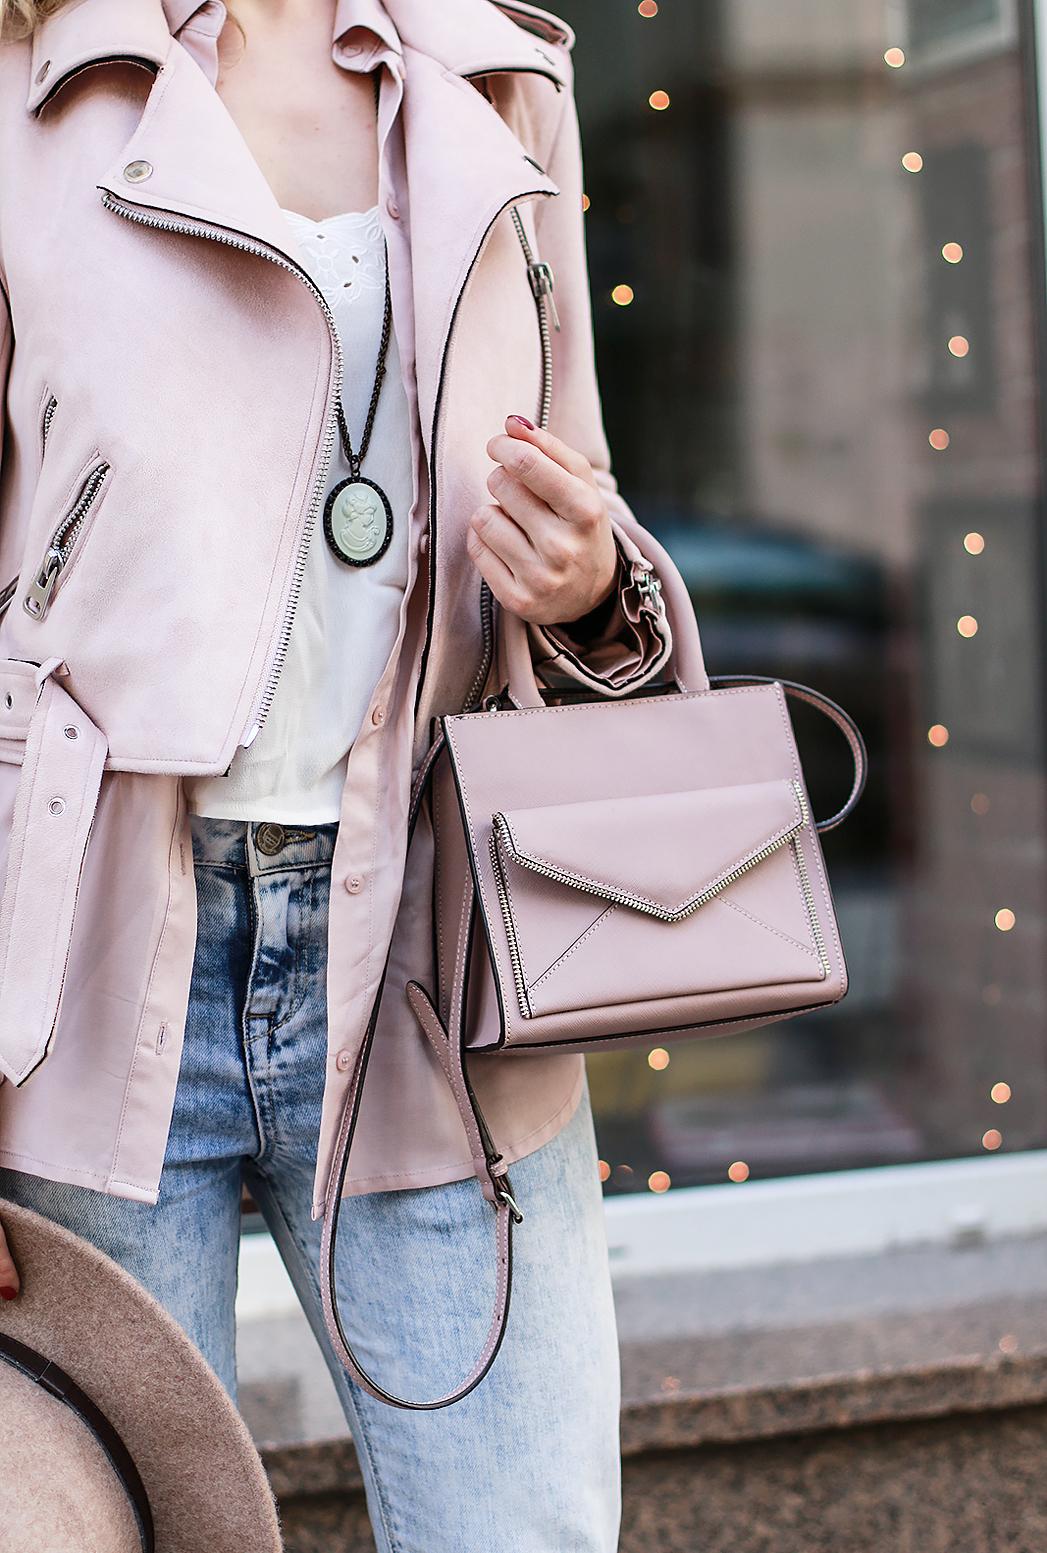 margarita_maslova_ritalifestyle_pink_pastel_look_romantic_summer_outfits_suede_pink_zara_Jacket_nude_heels_hat_jeans_boyfriend